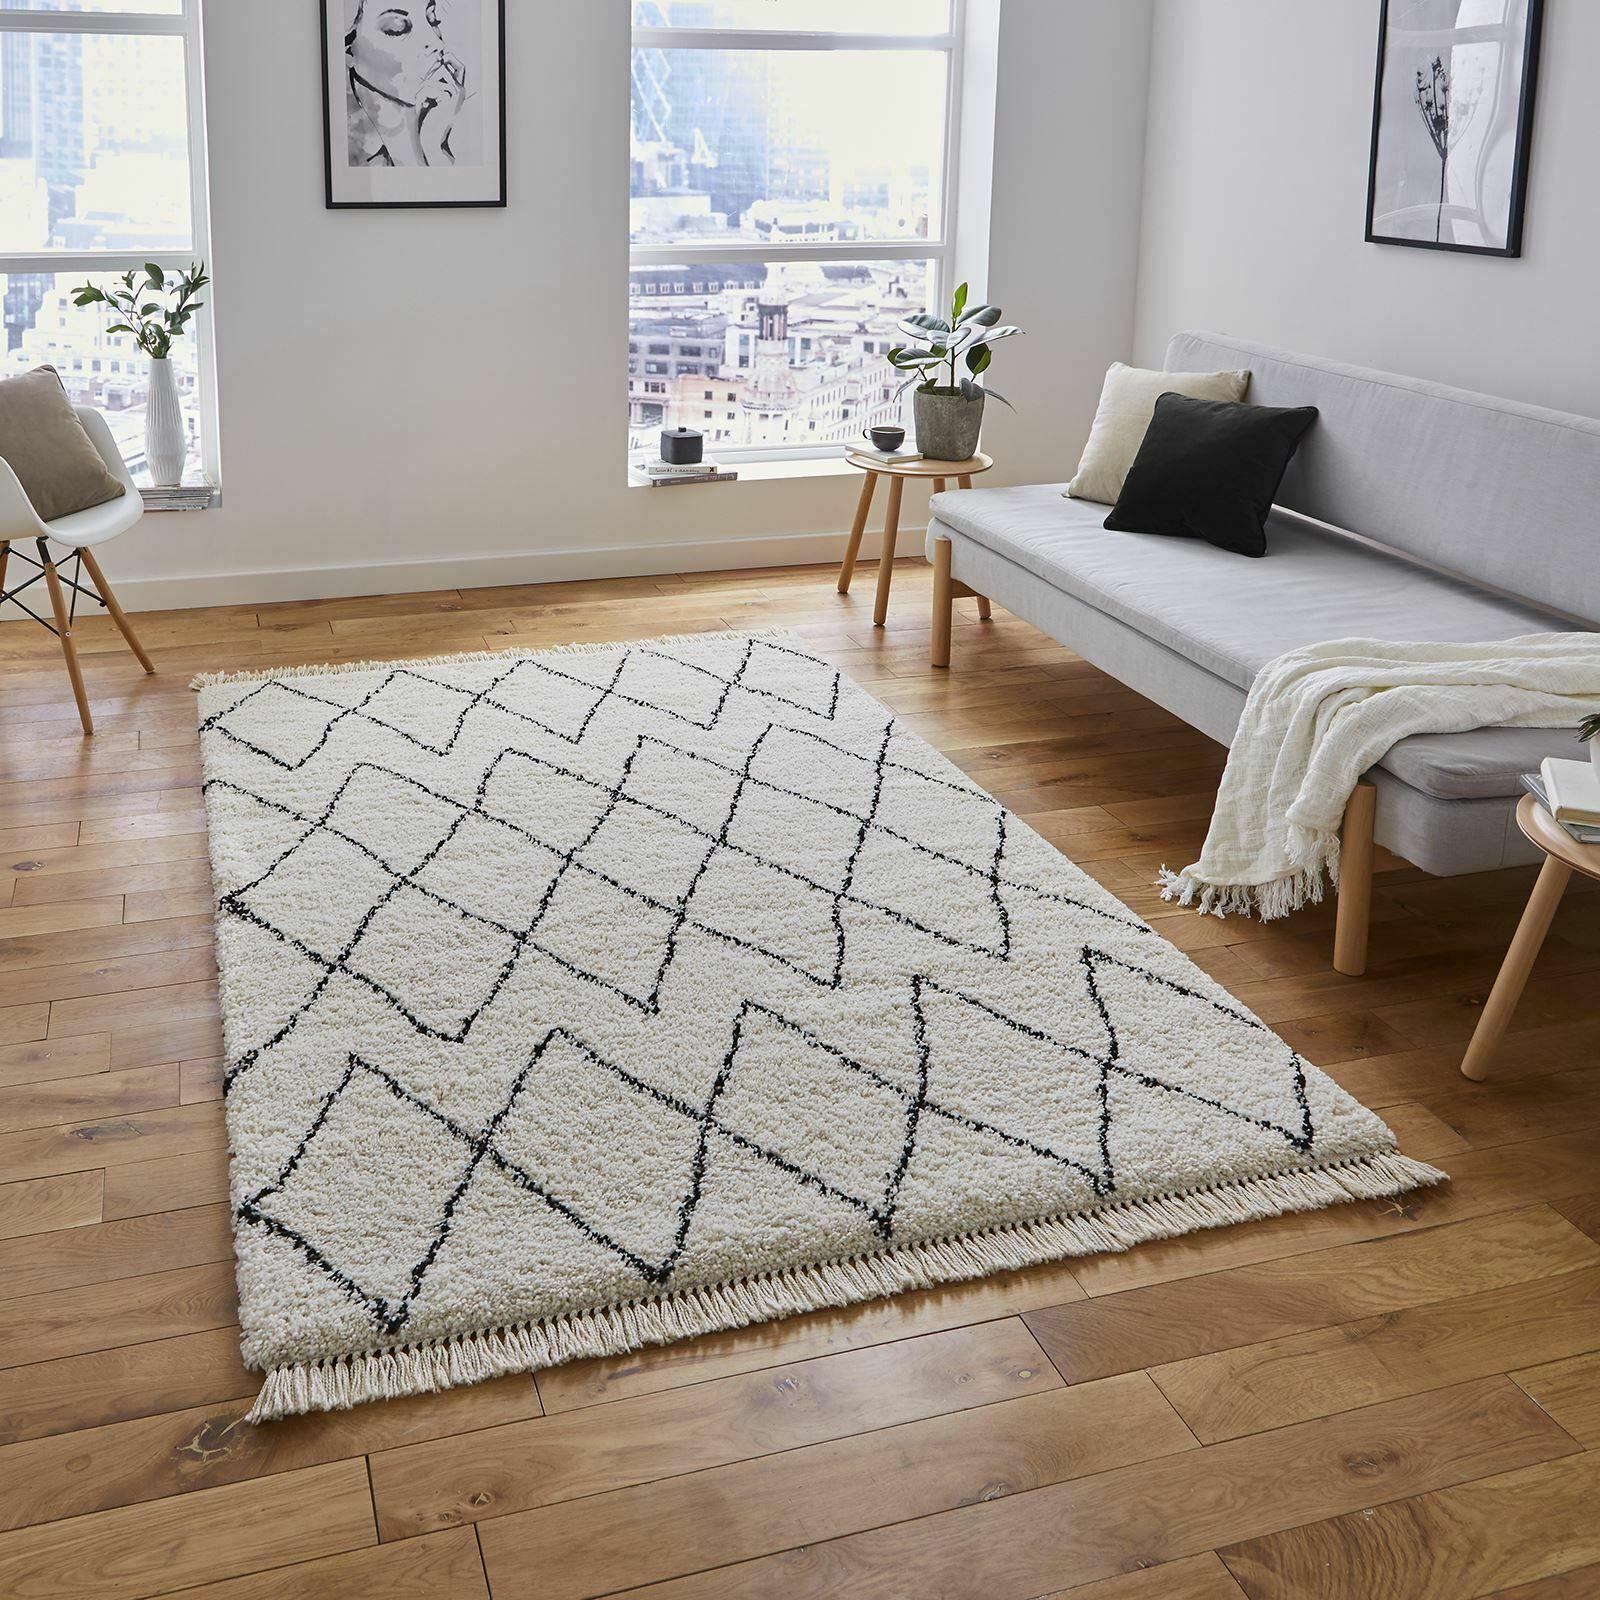 Moroccan Modern Shaggy Style Deep Soft Pile Carpet Boho 8280 Rugs In White Black Ebay In 2020 White Rug Rugs In Living Room Boho Carpets